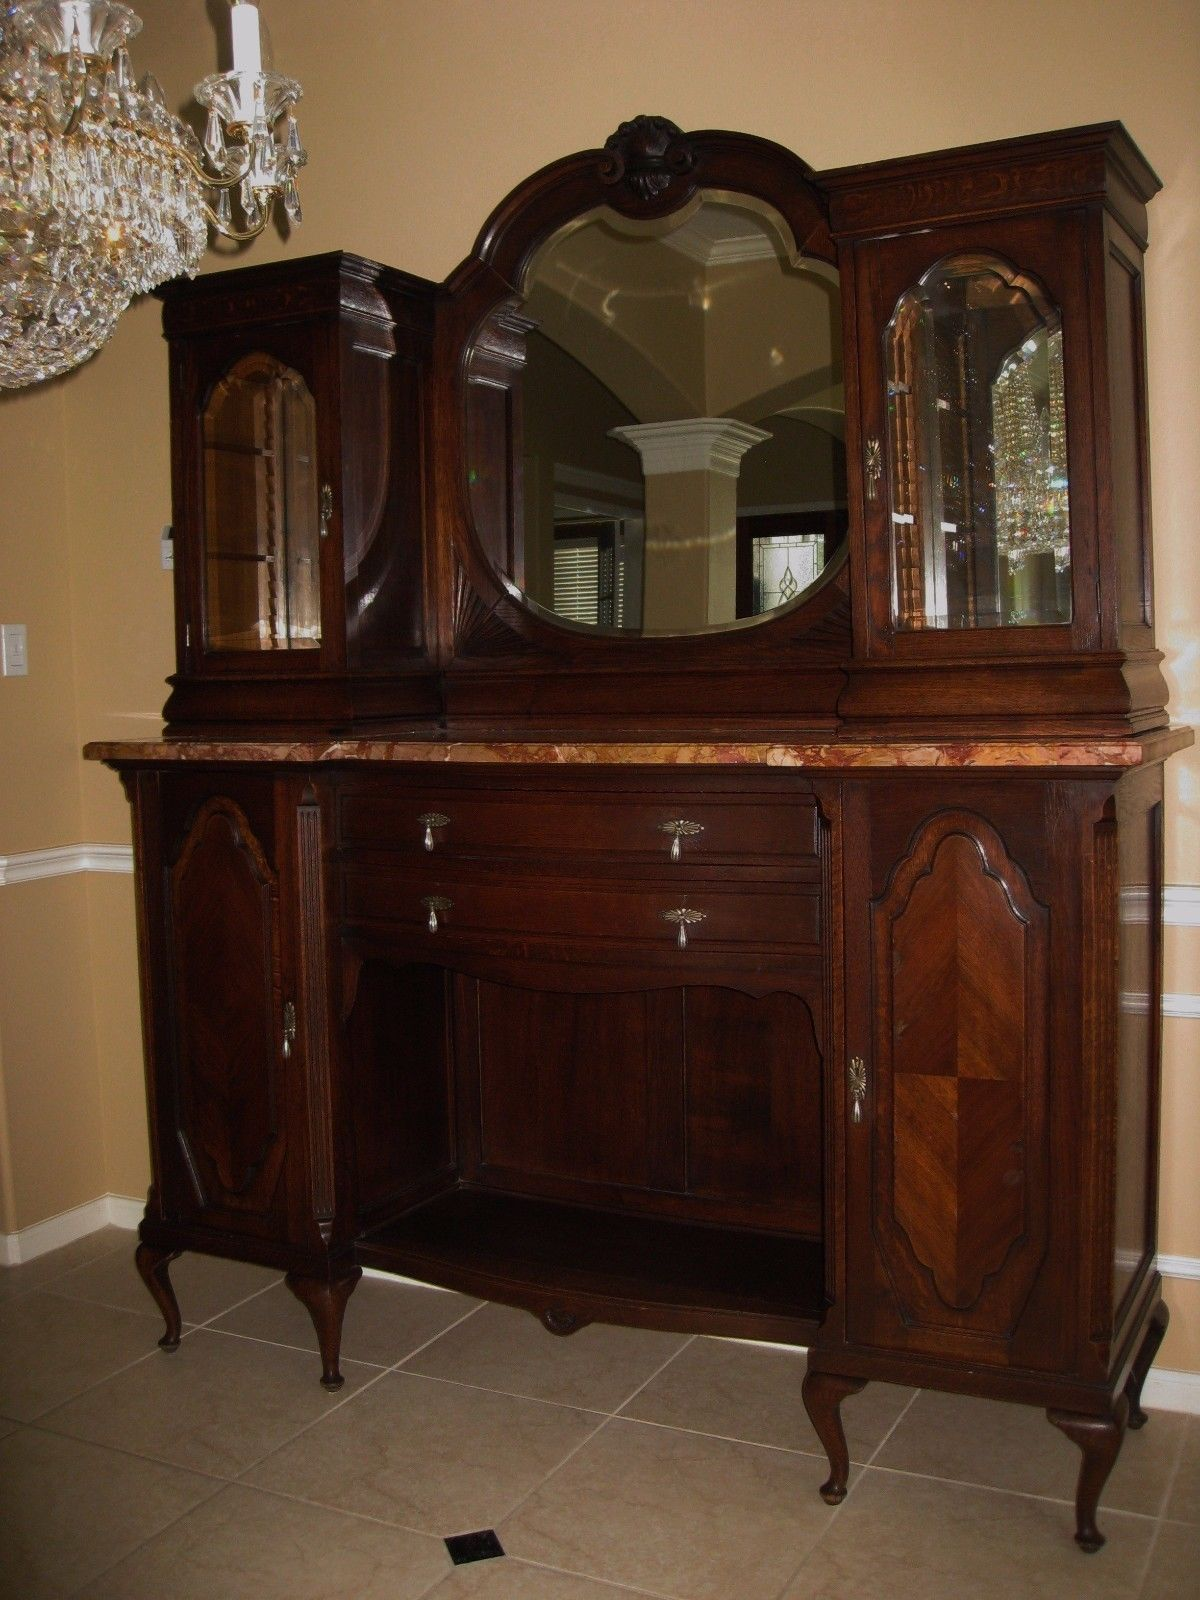 Antique Belgium Oak & Marble Sideboard Buffet Server